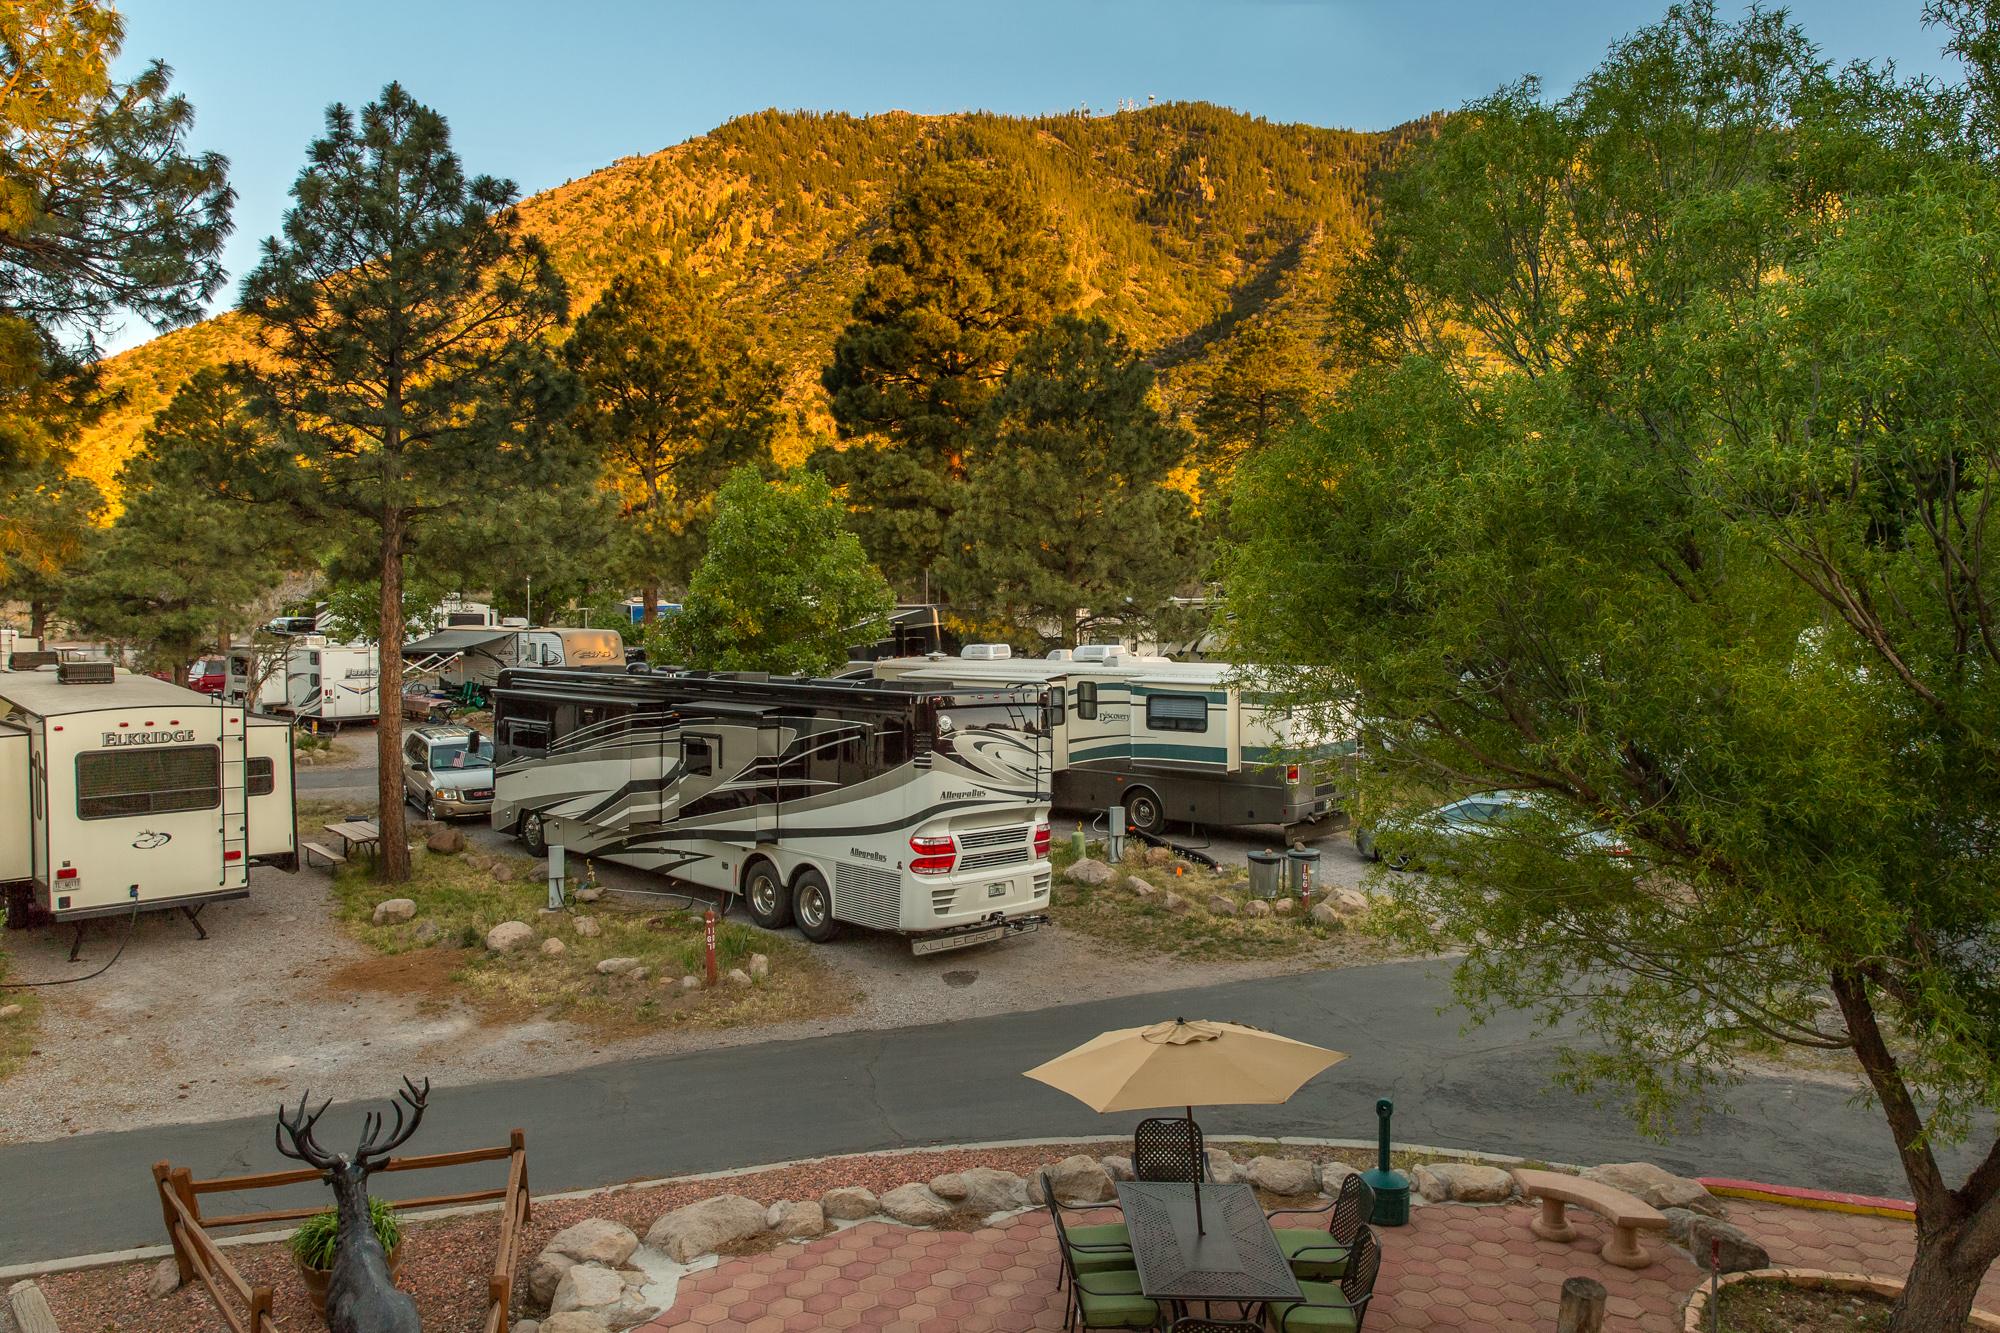 Map Of Koa Arizona.Flagstaff Koa Campground Flagstaff Az 86004